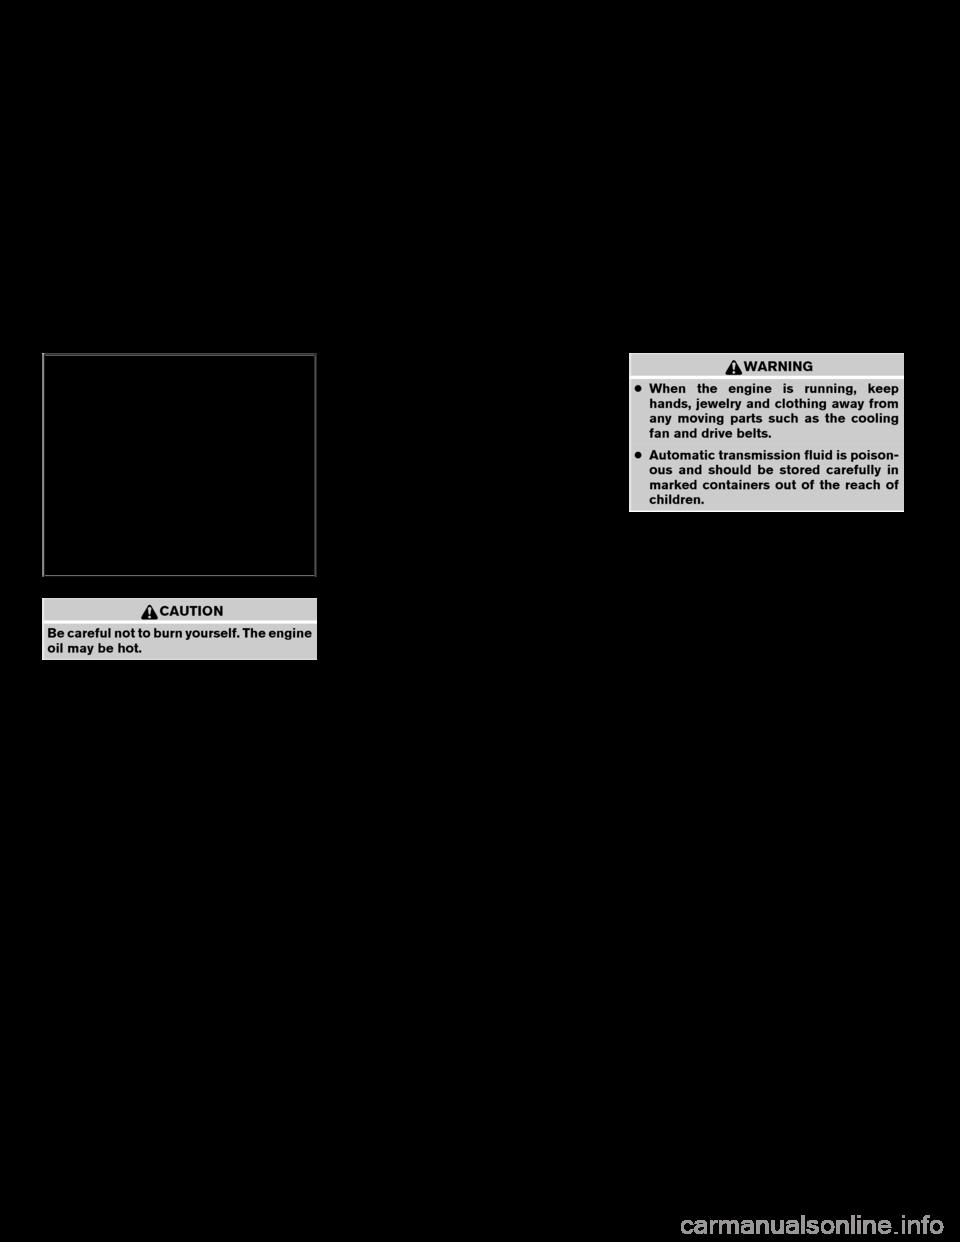 NISSAN SENTRA 2004 B15 / 5 G